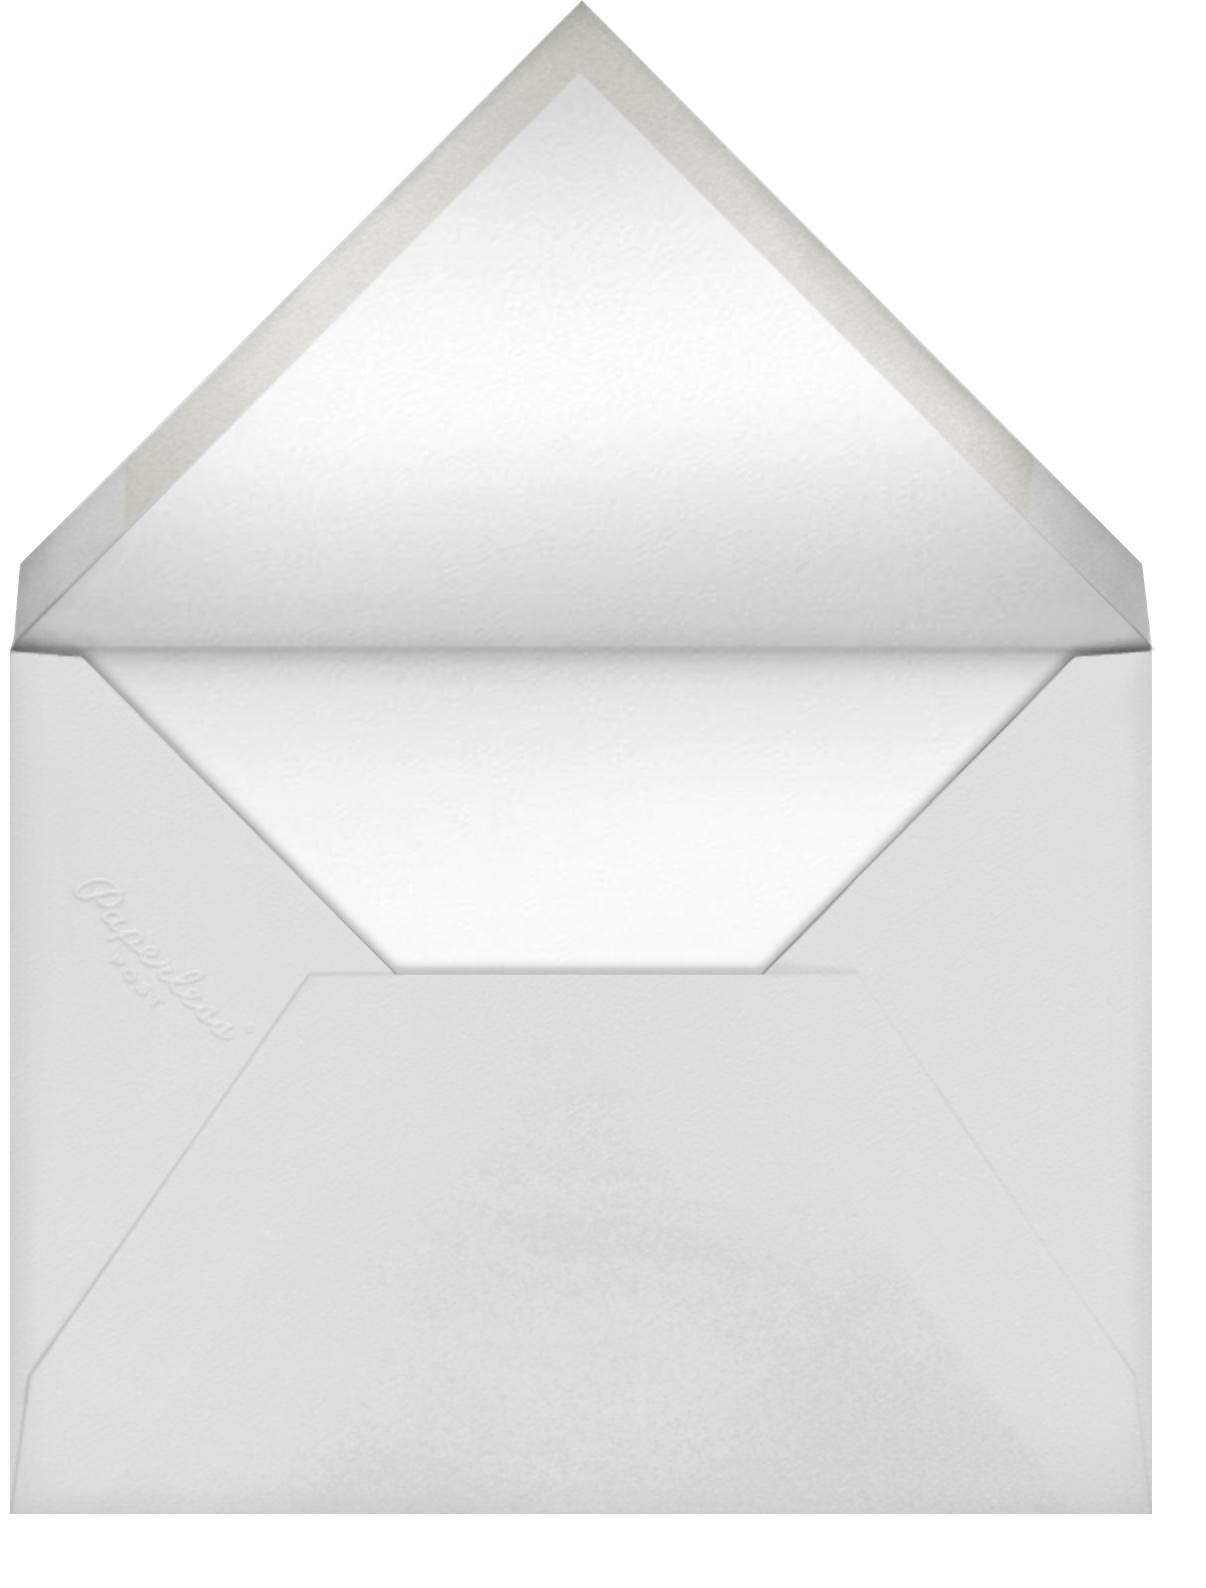 Sugar - Horizontal - Kelly Wearstler - null - envelope back